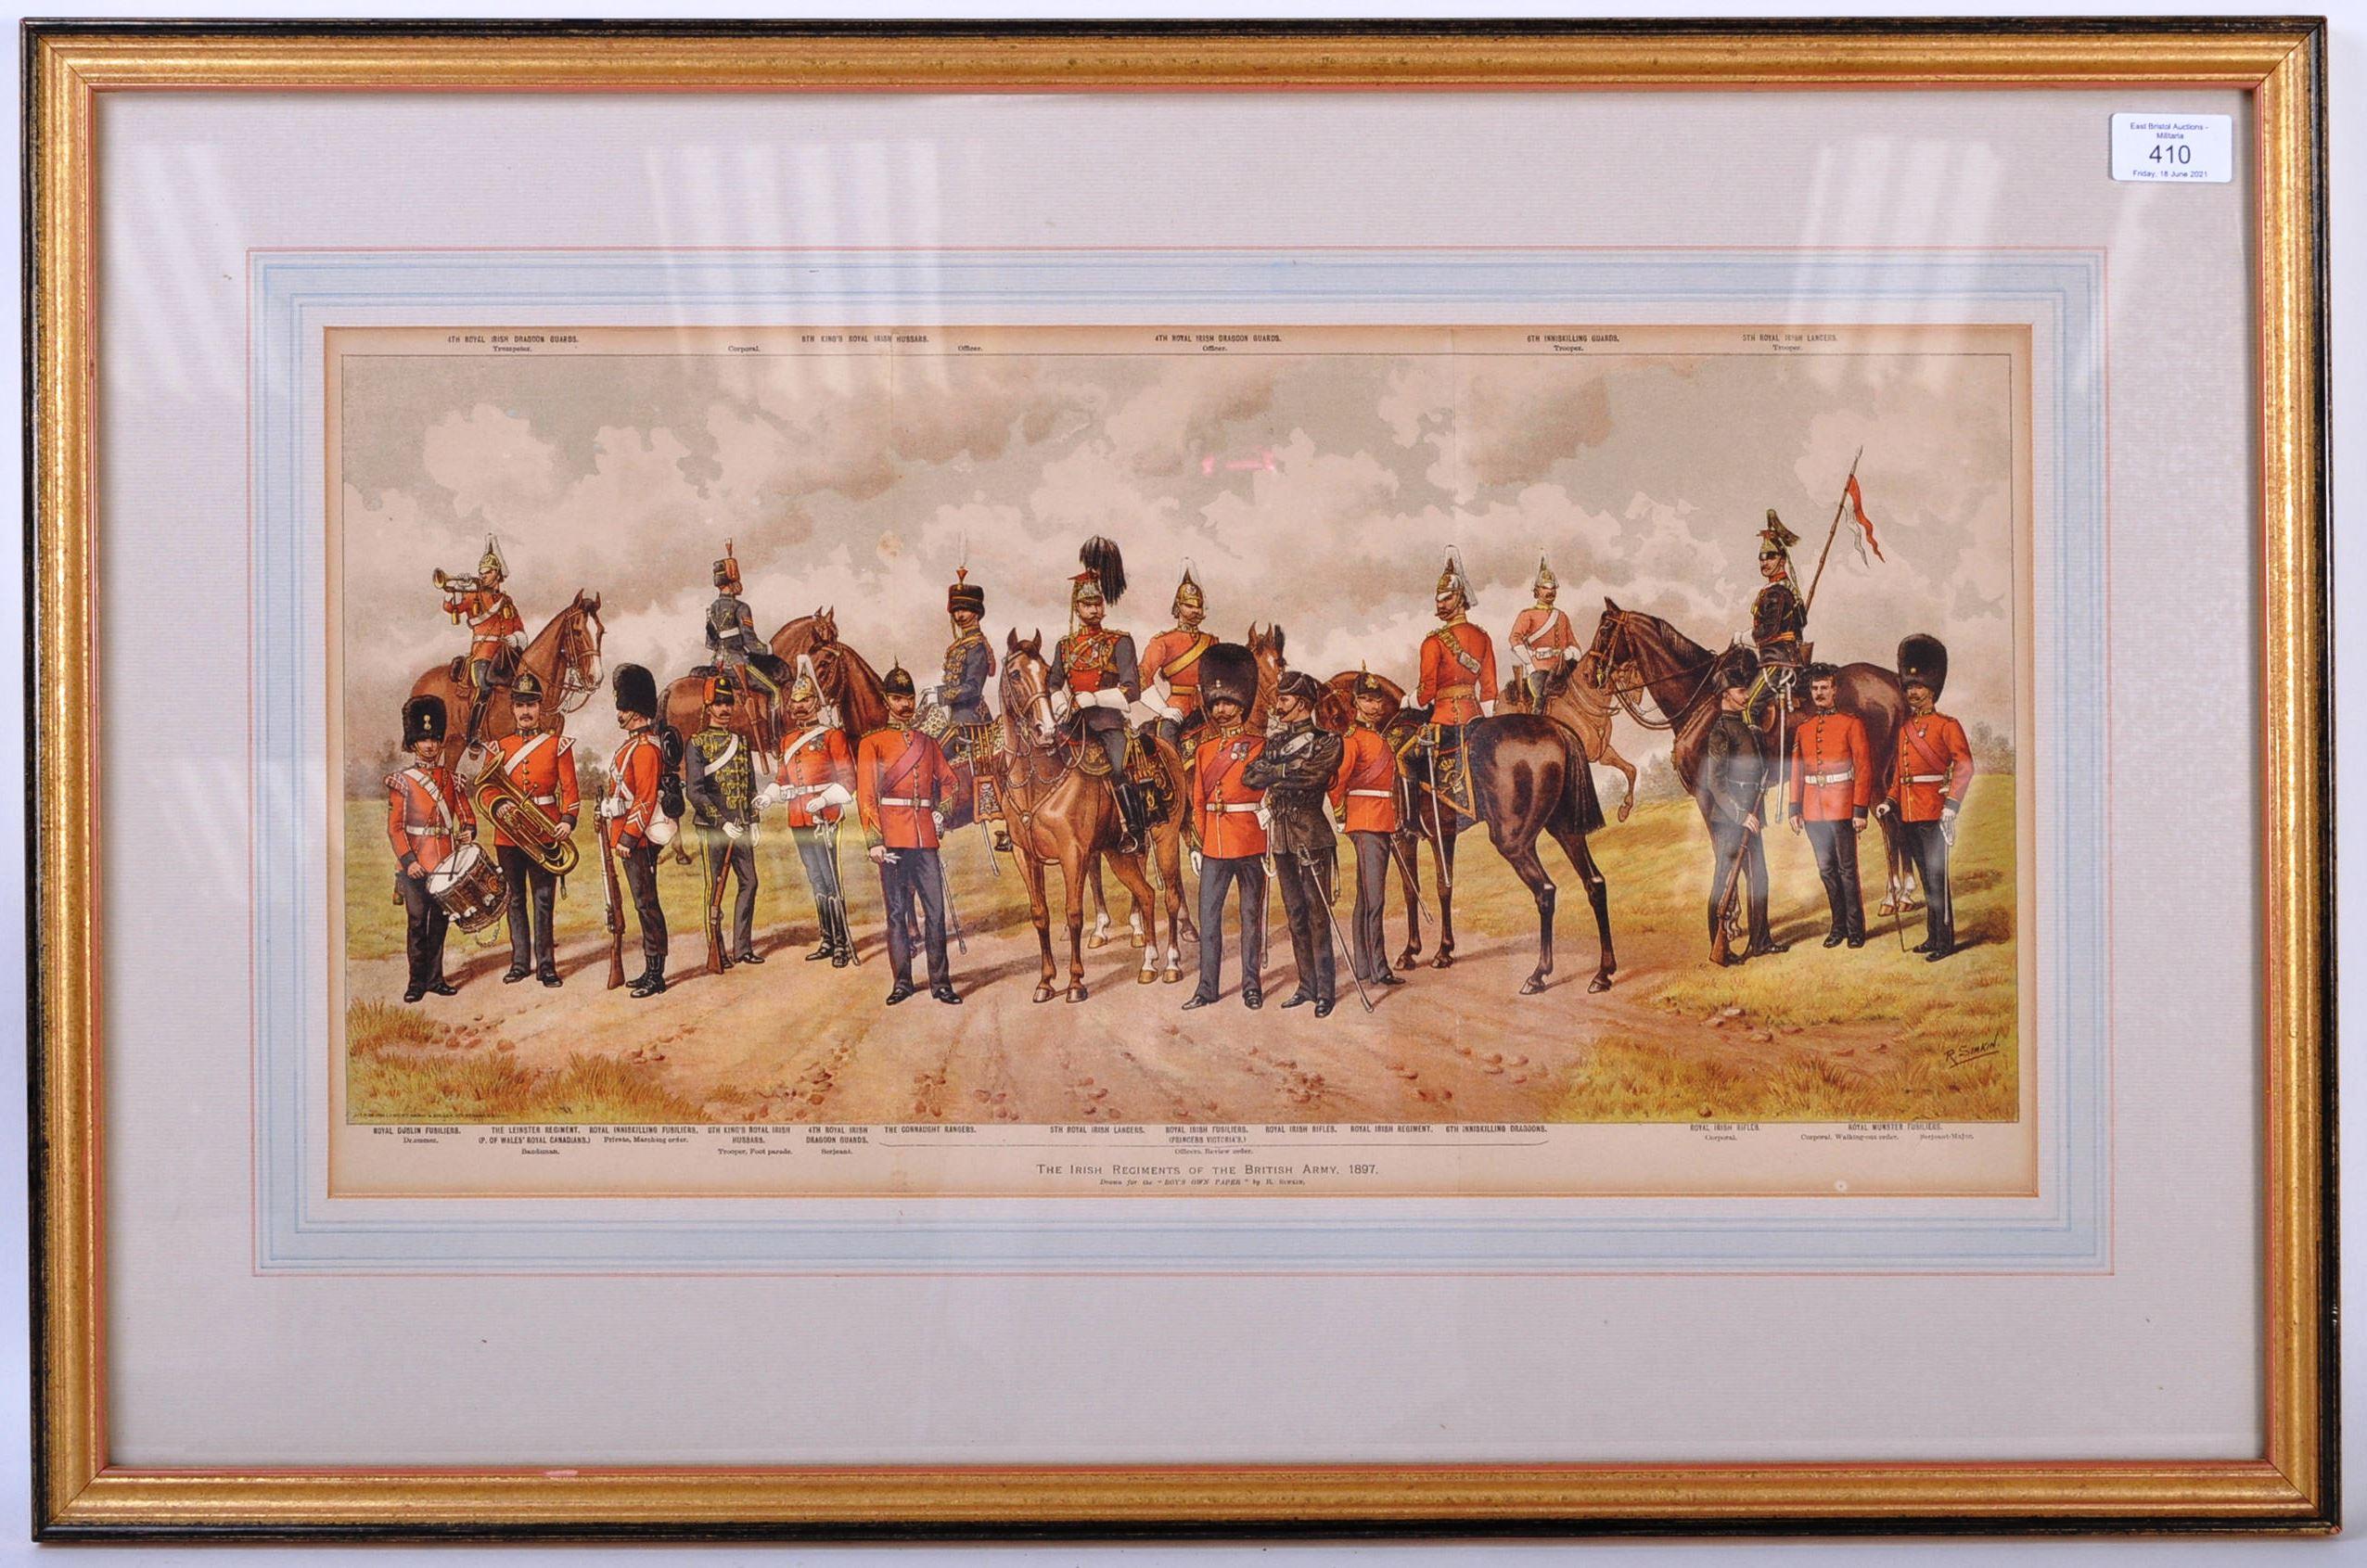 RICHARD SIMKIN - THE IRISH REGIMENTS OF THE BRITISH ARMY